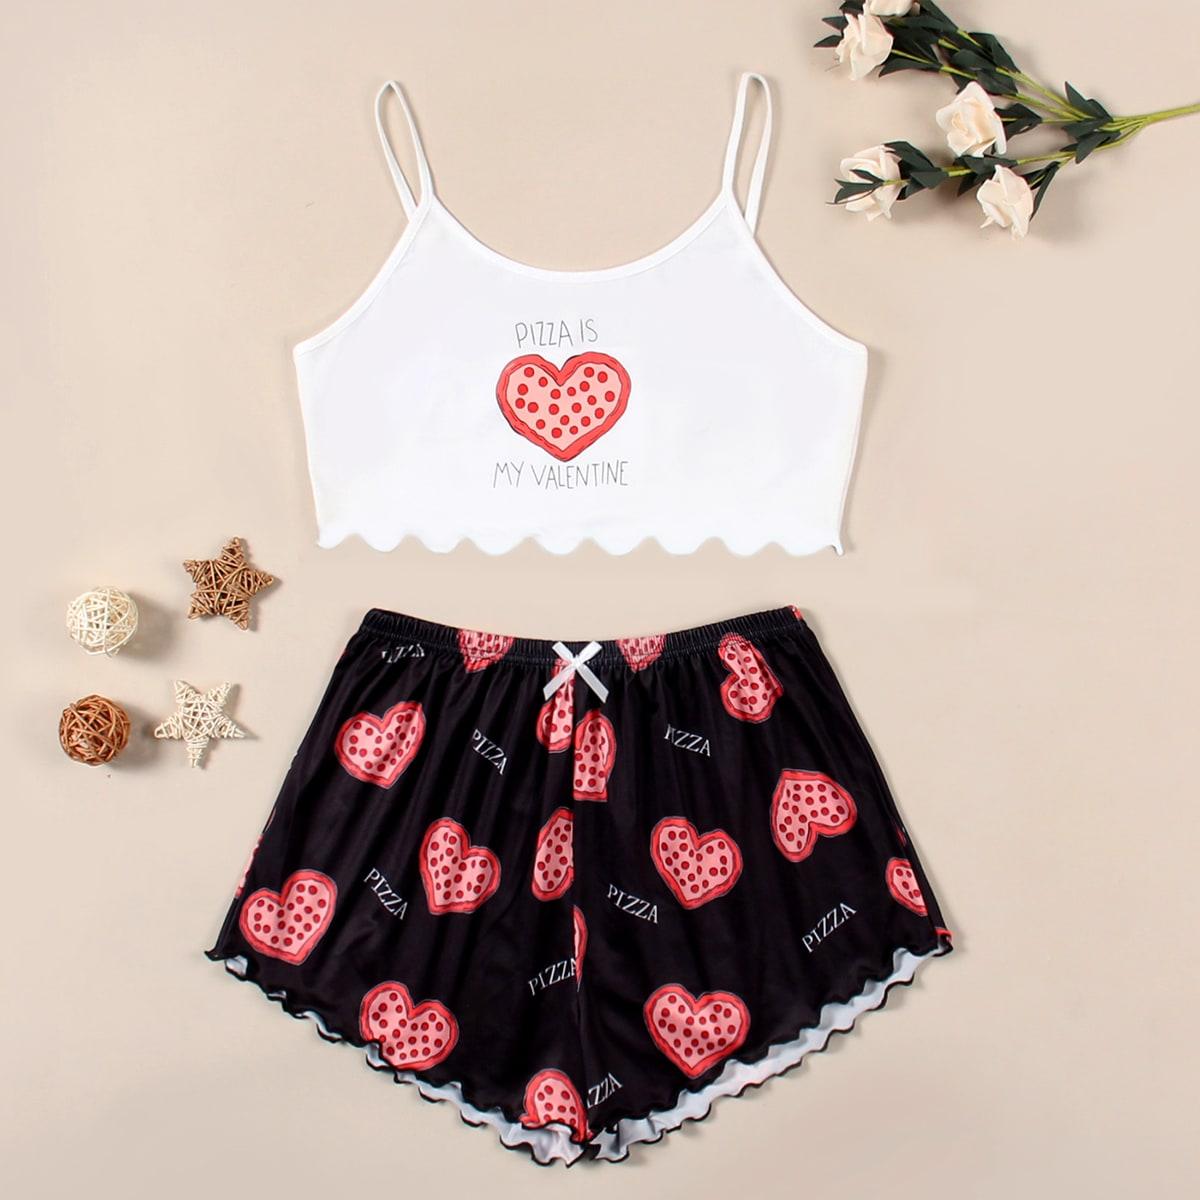 SHEIN / Heart Print Lettuce Trim Pajama Set